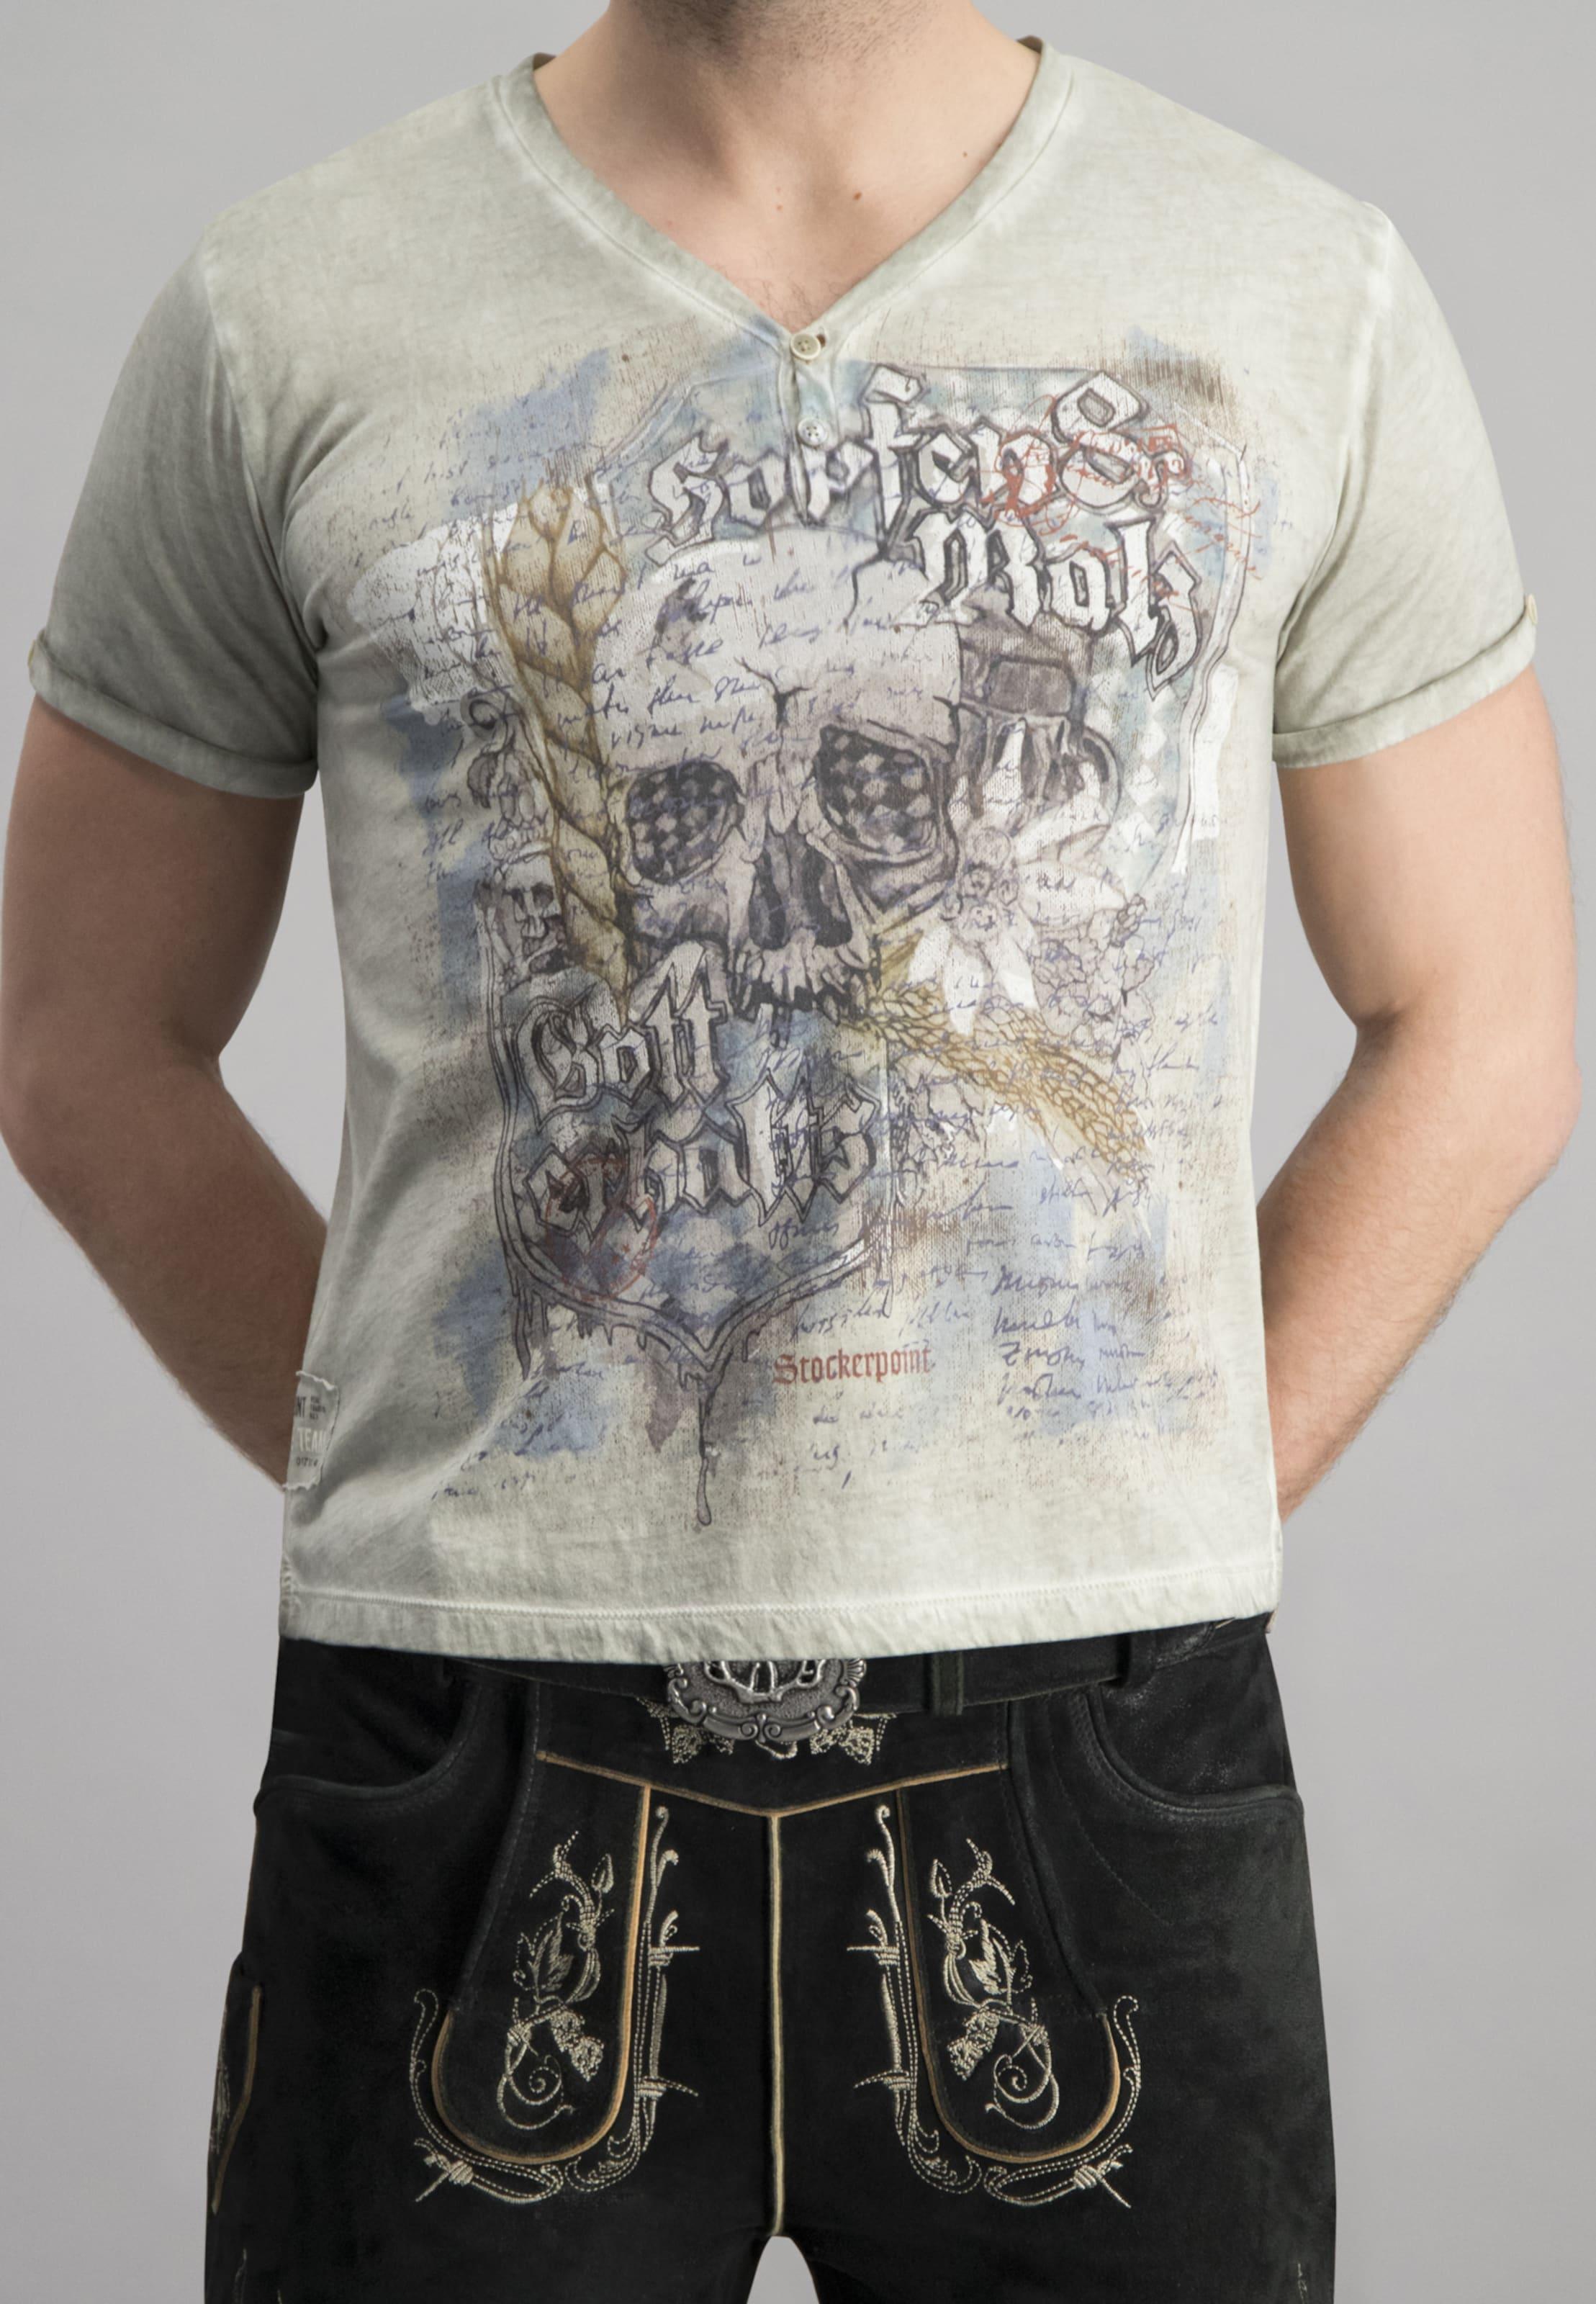 In Grau Stockerpoint Stockerpoint Shirt In Stockerpoint Shirt Grau uZiwOPkXT